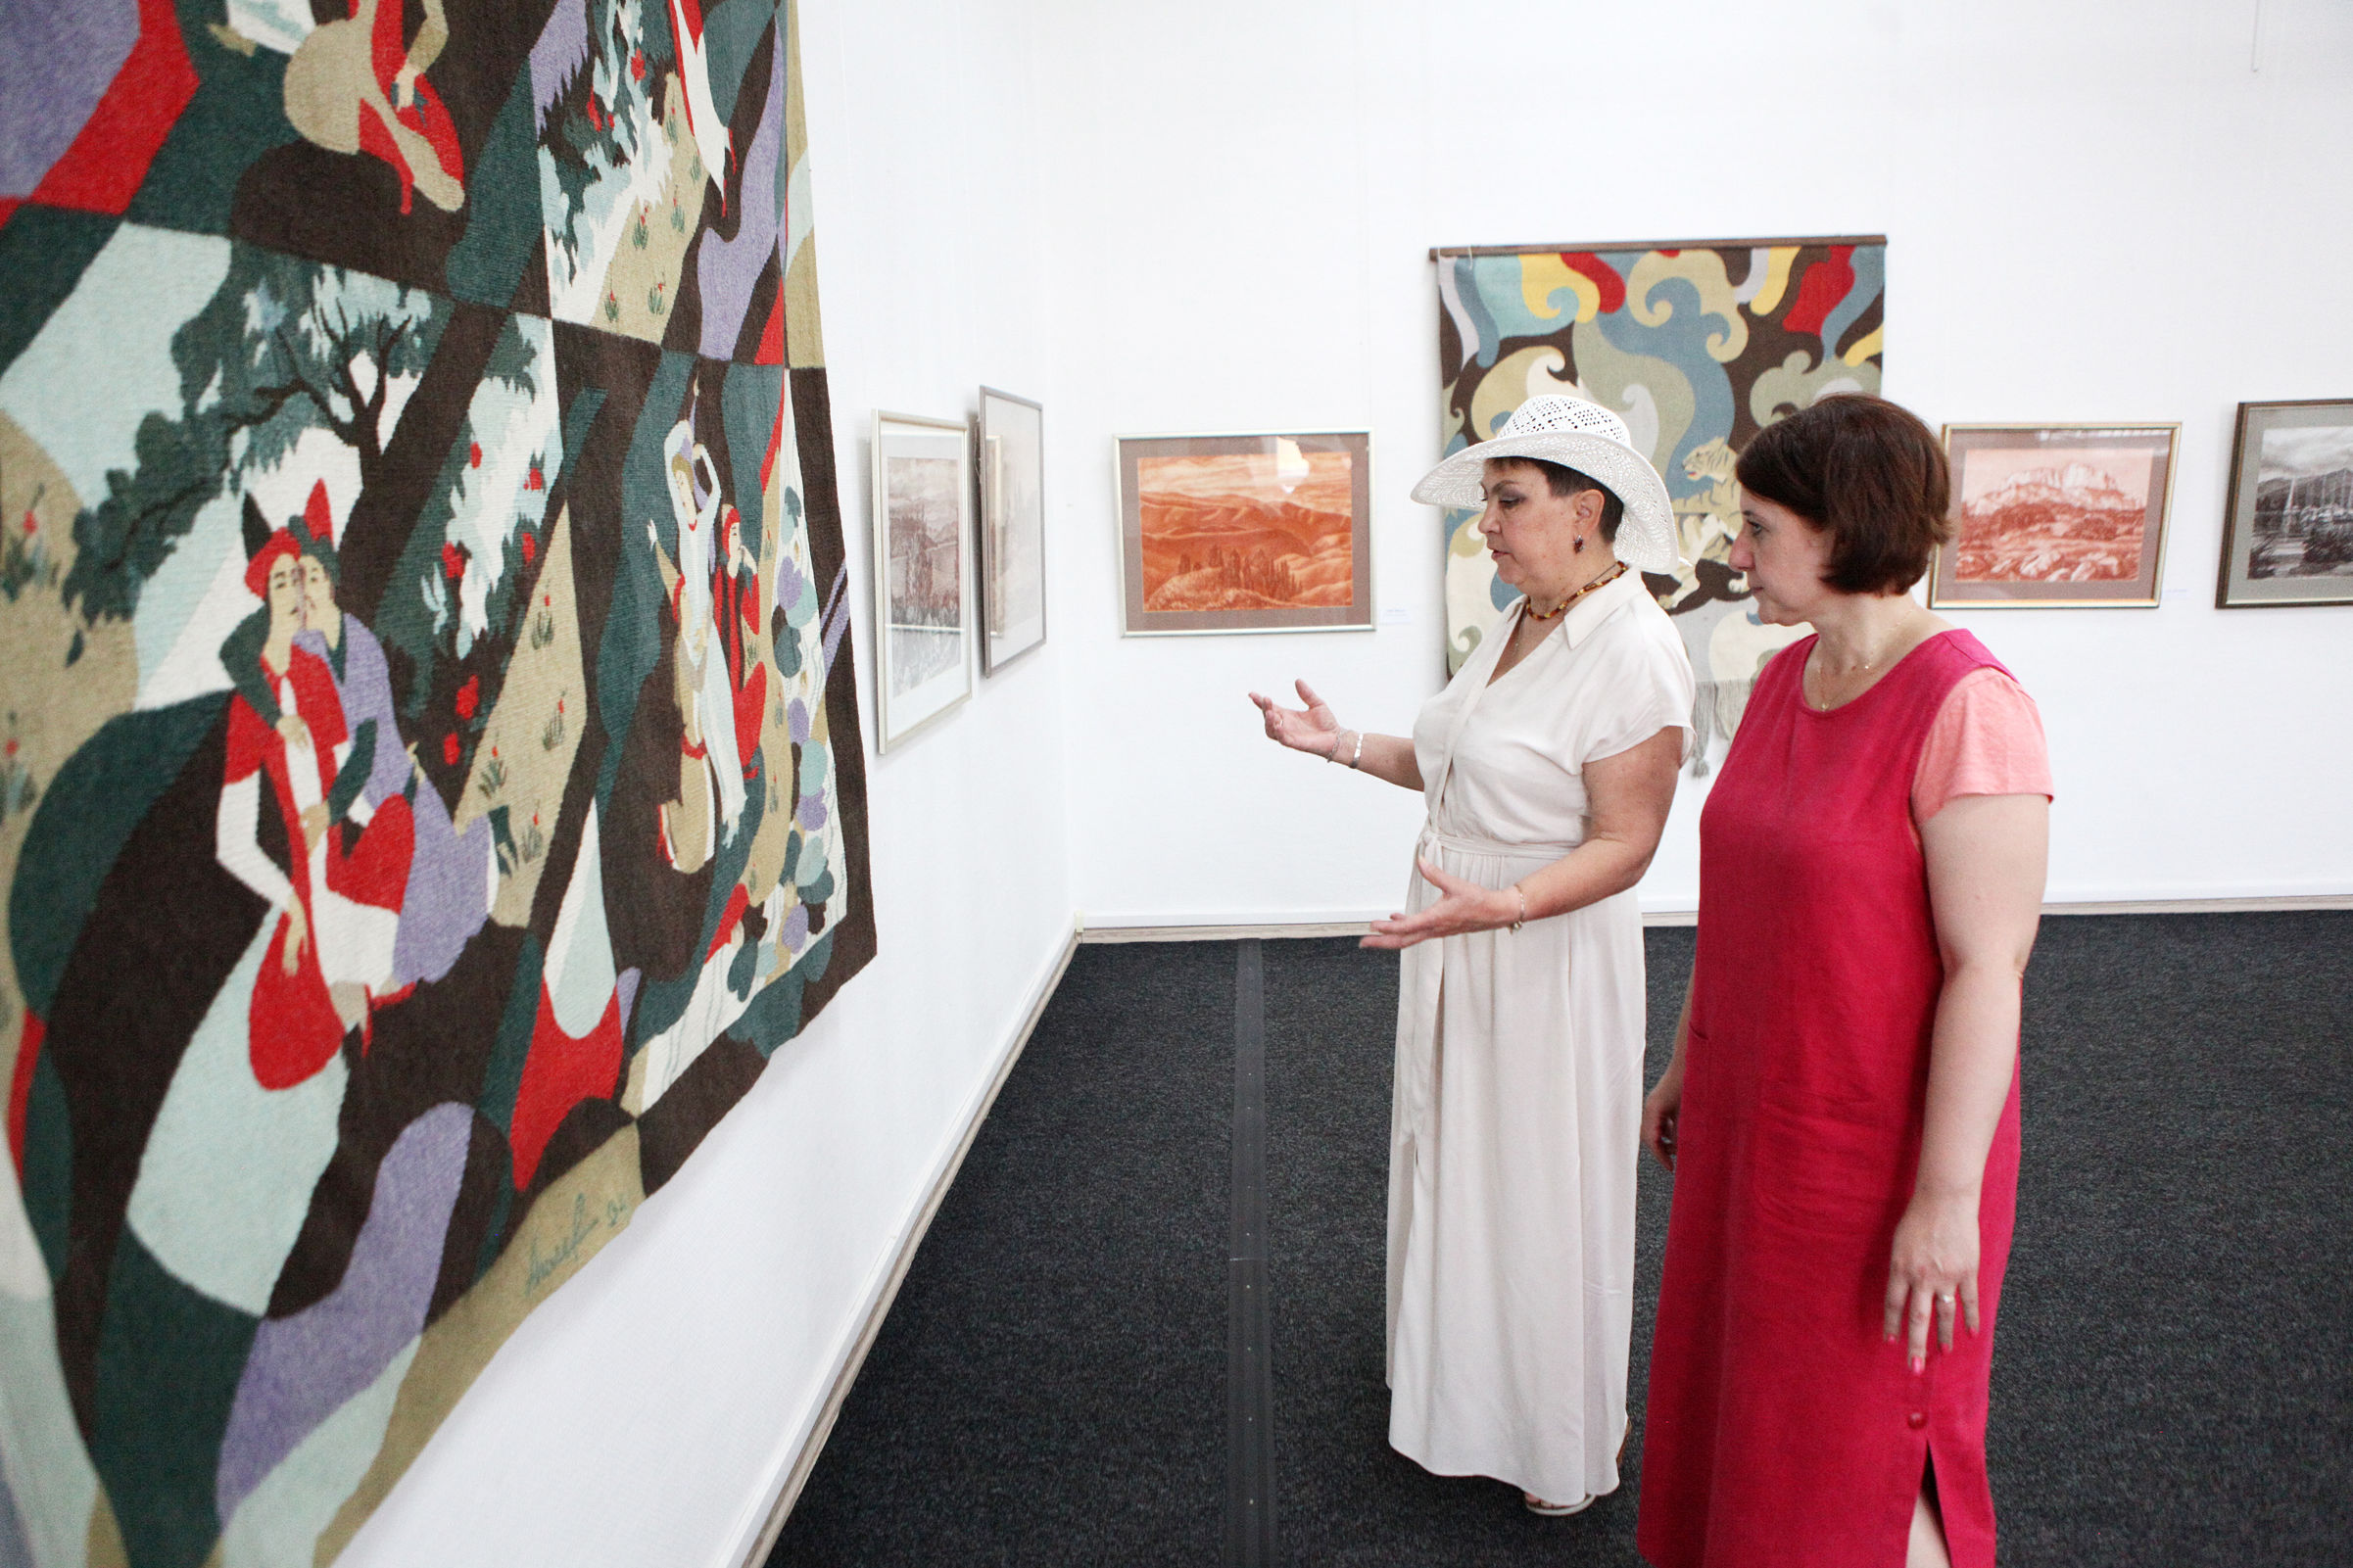 В Ярославле представили работы художника-монументалиста Бориса Анисимова